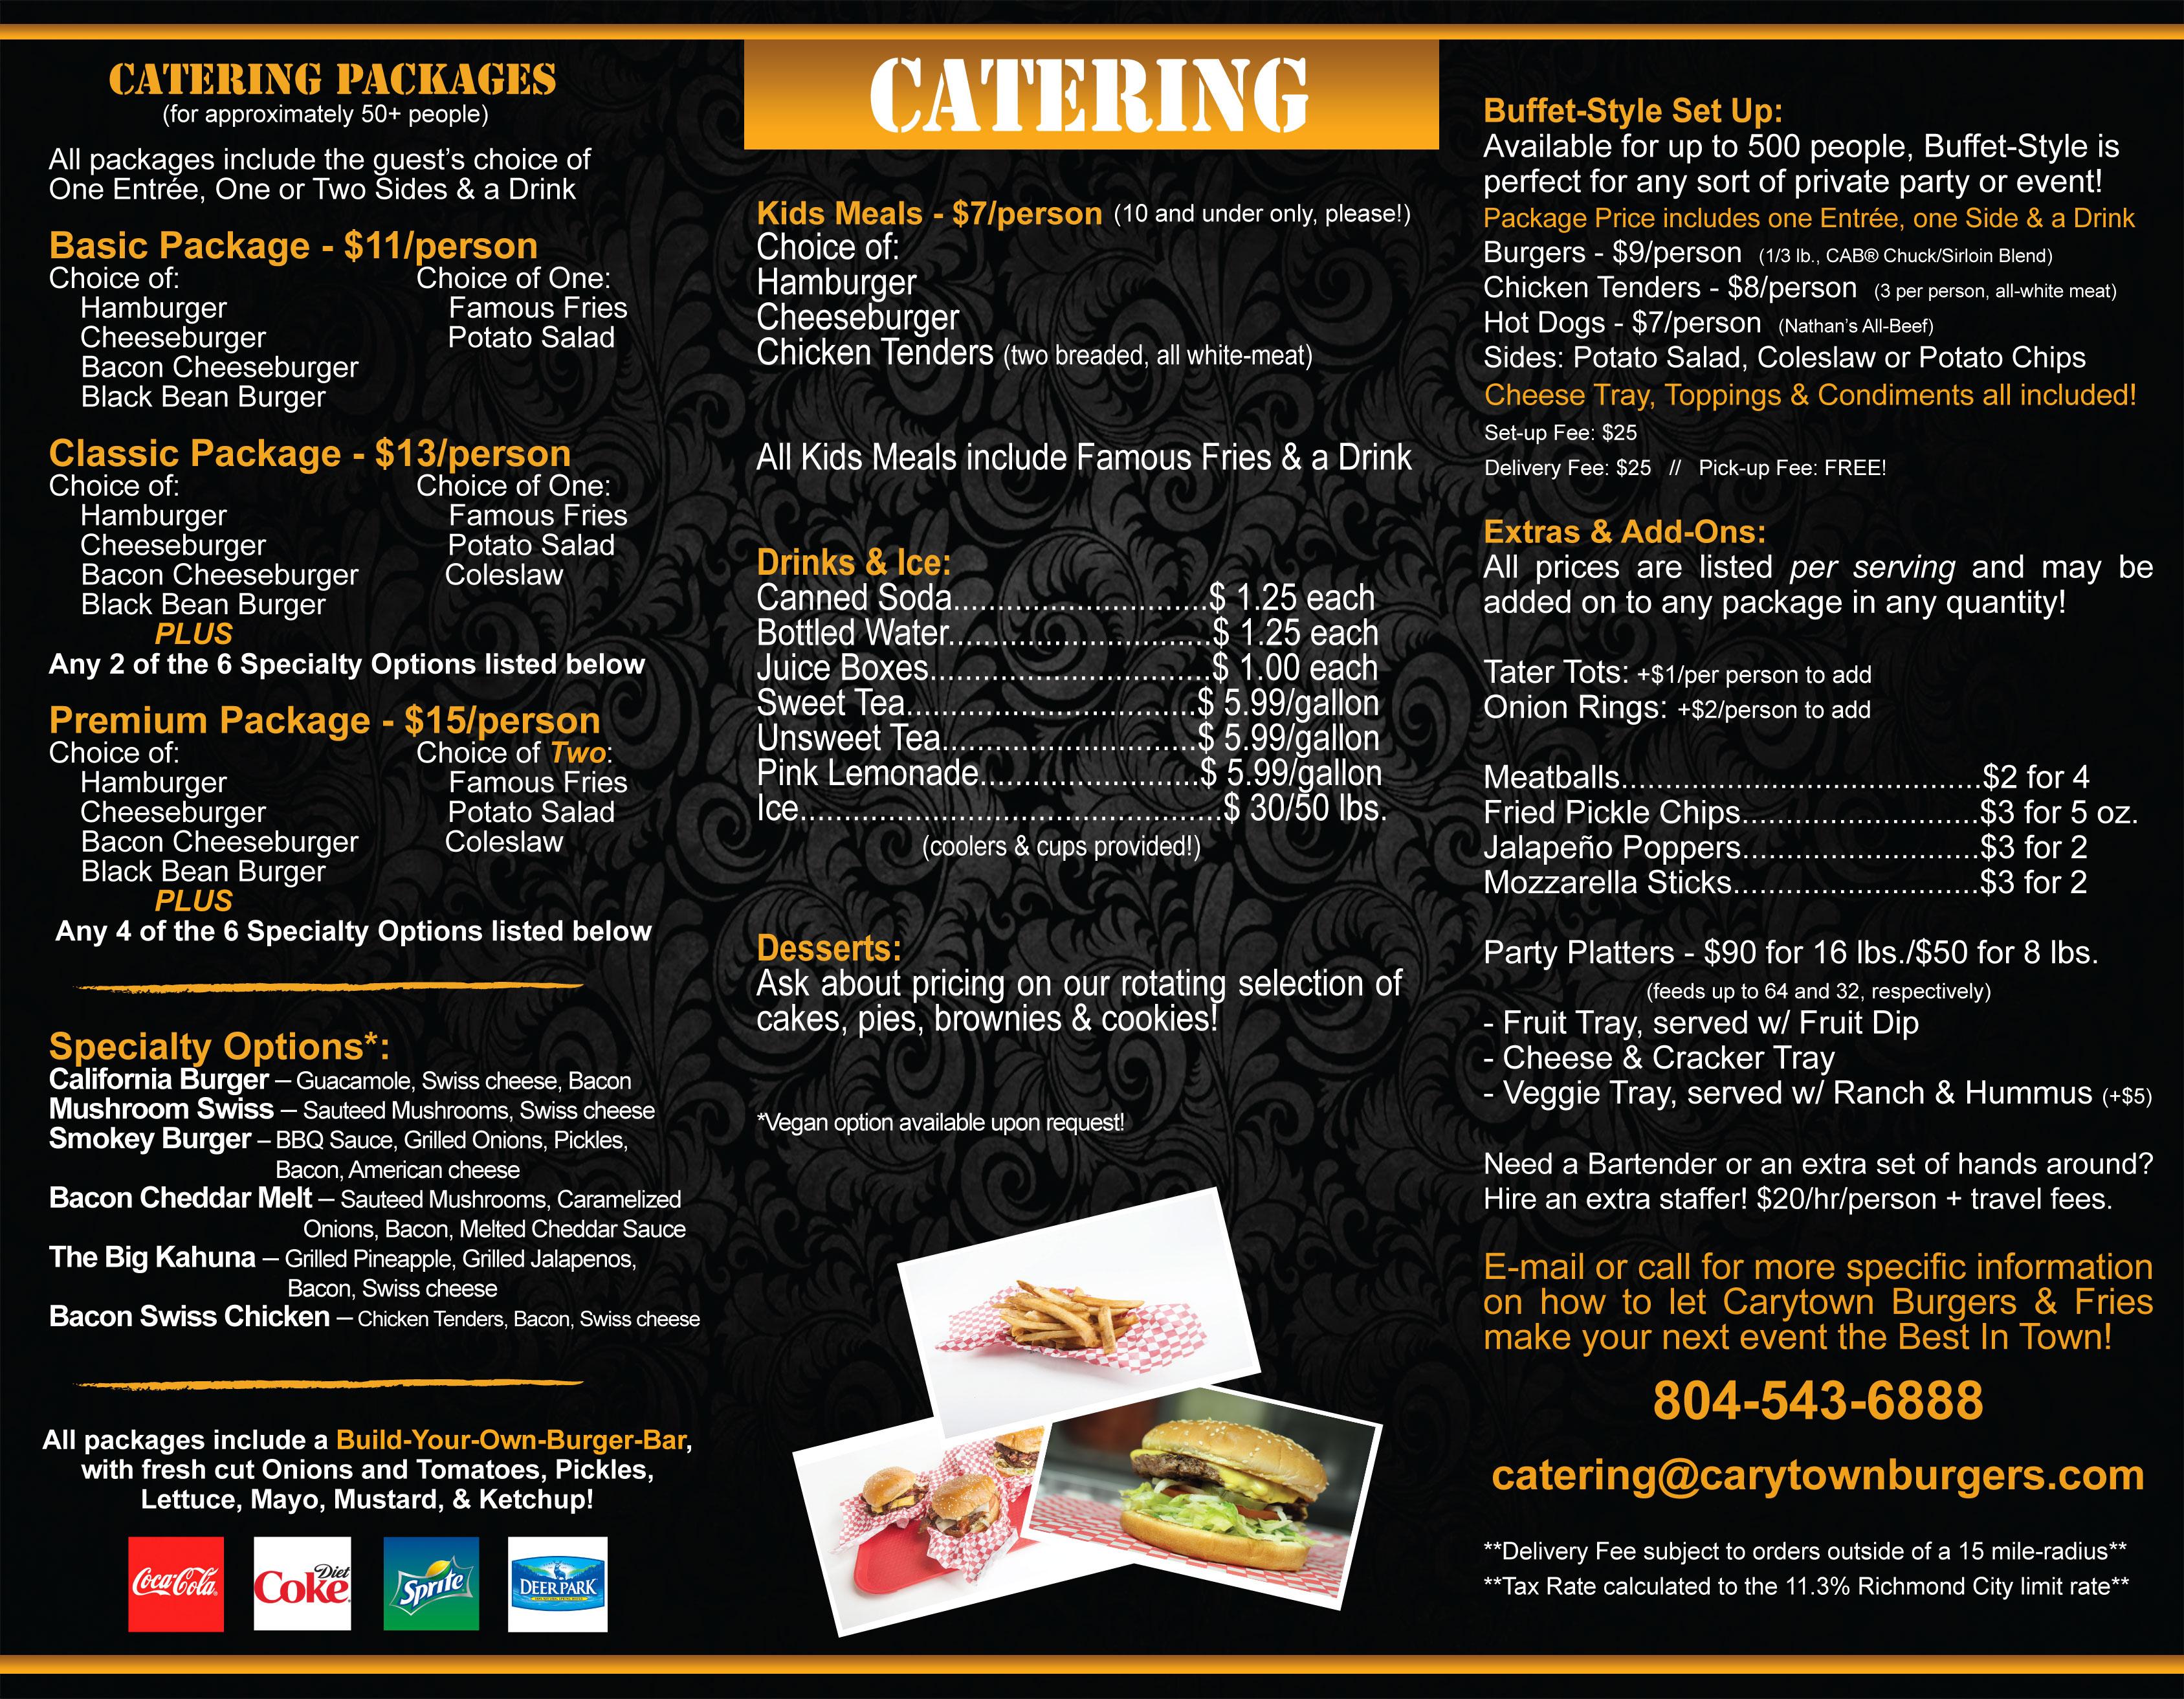 Catering Carytown Burgers Fries Richmond Virginia